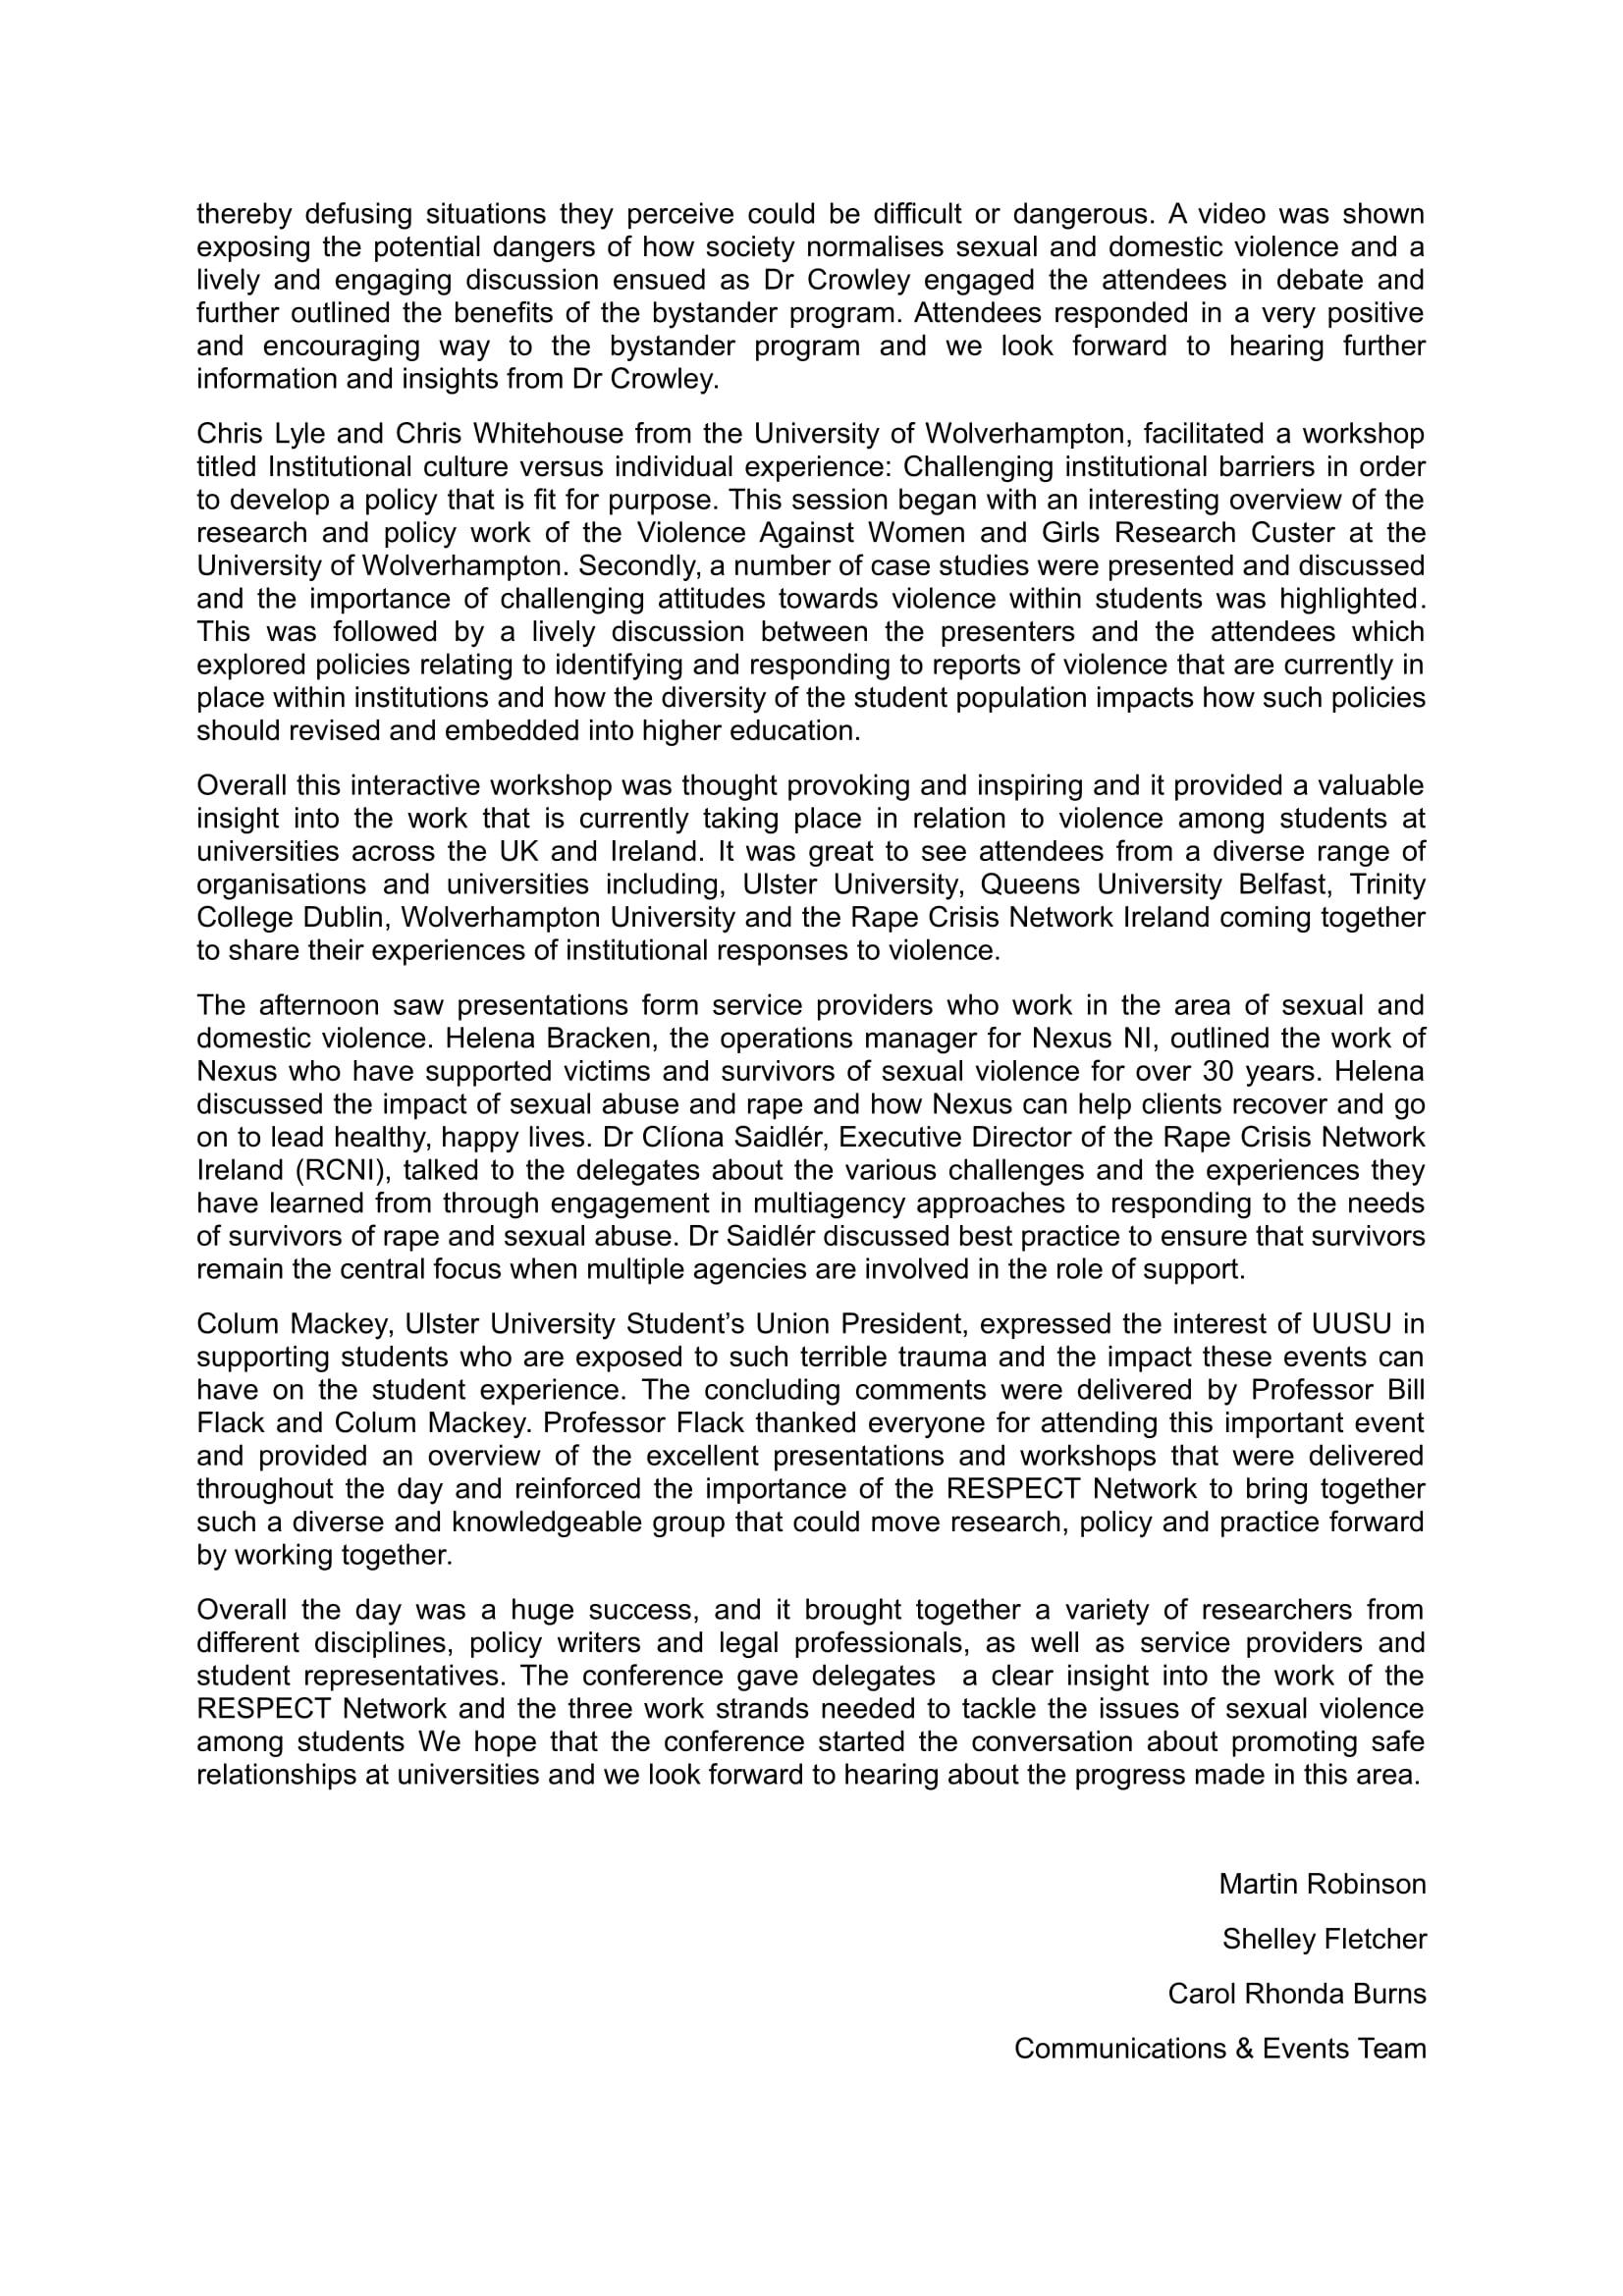 Conference Reflecion final 030217-2.jpg